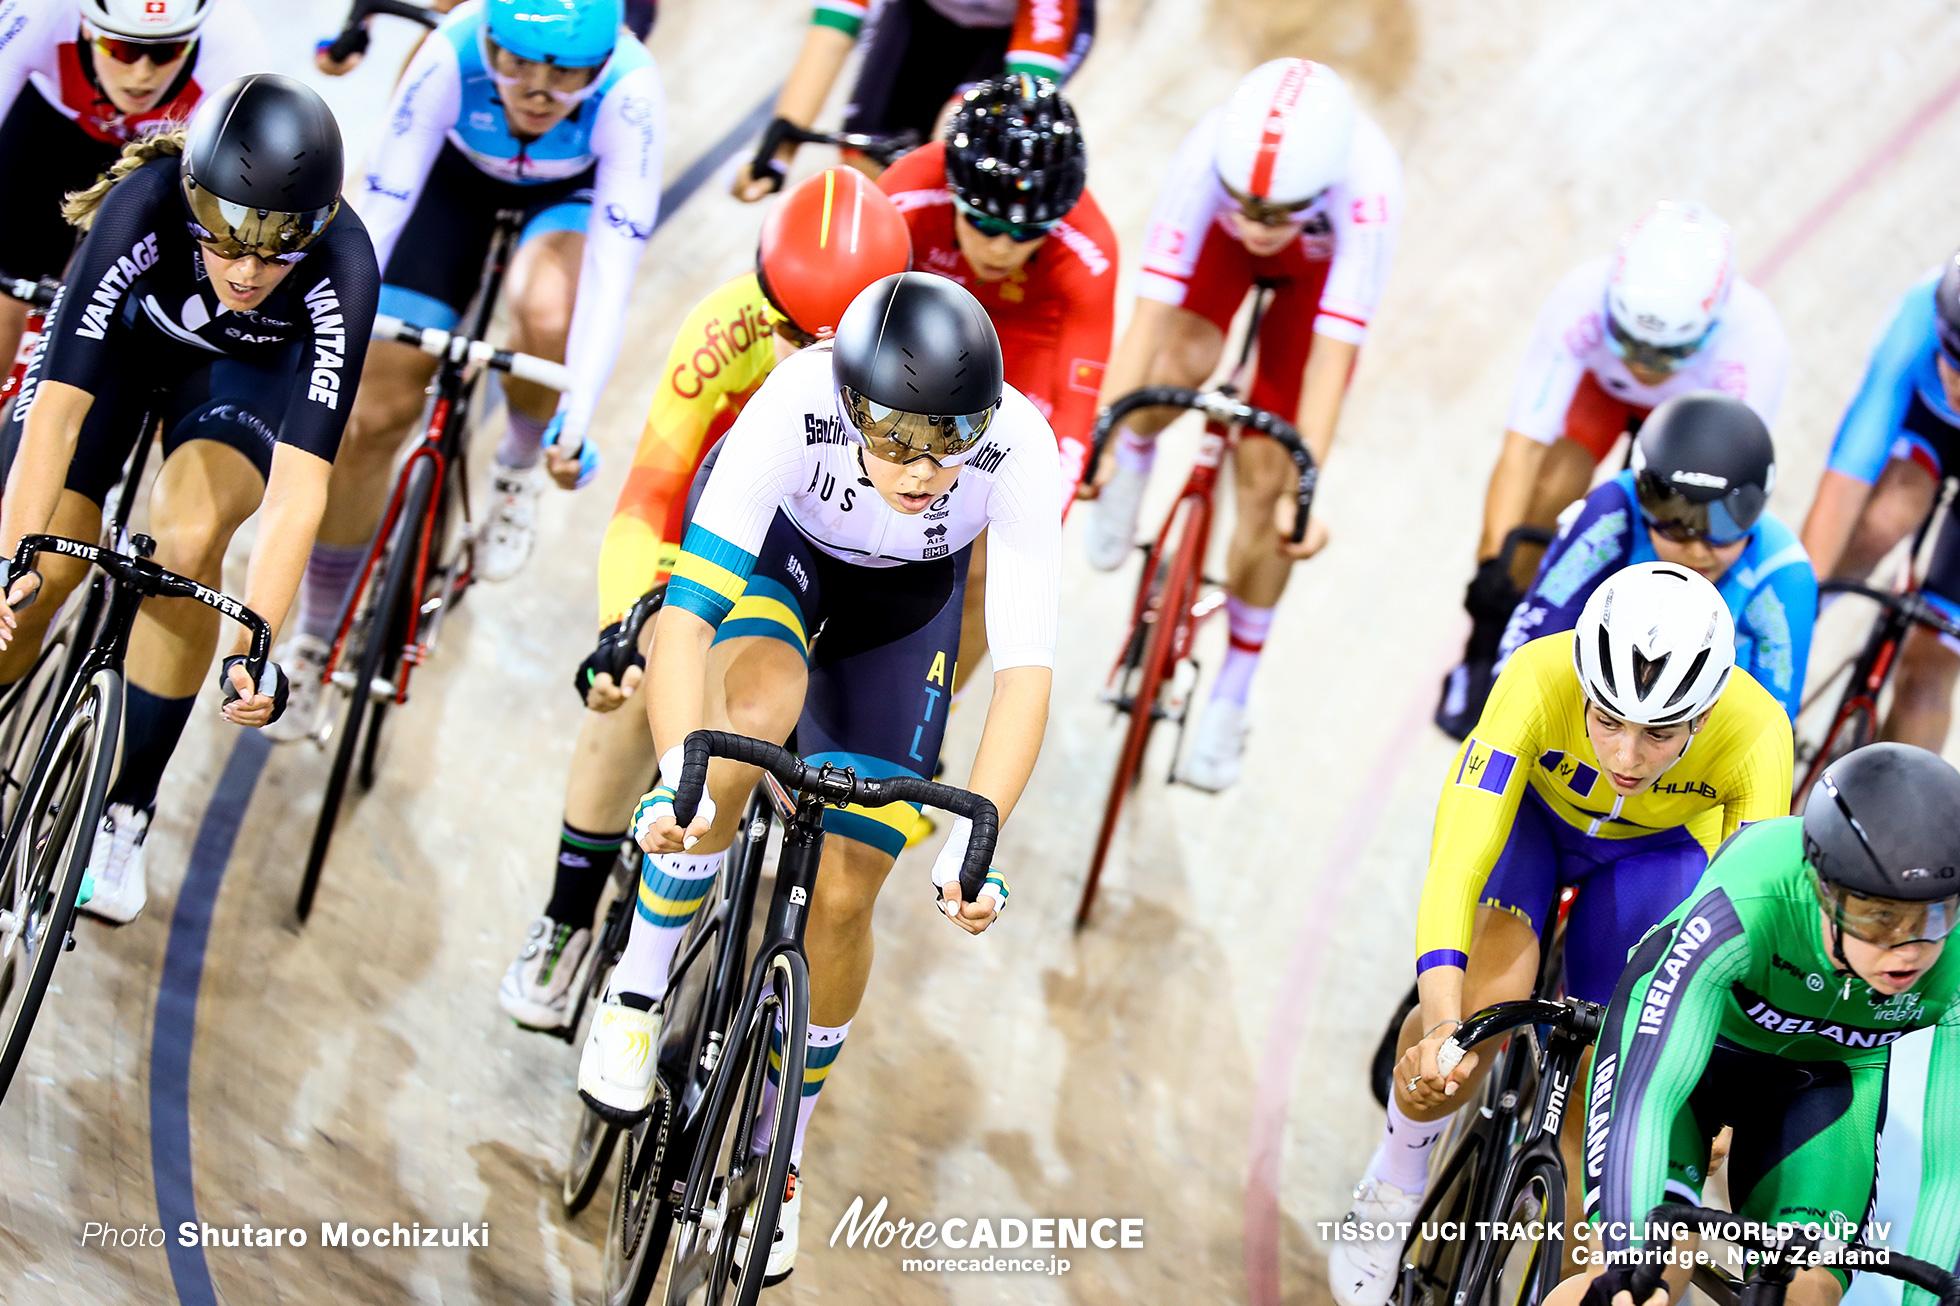 Scratch Race / Women's Omnium / TISSOT UCI TRACK CYCLING WORLD CUP IV, Cambridge, New Zealand